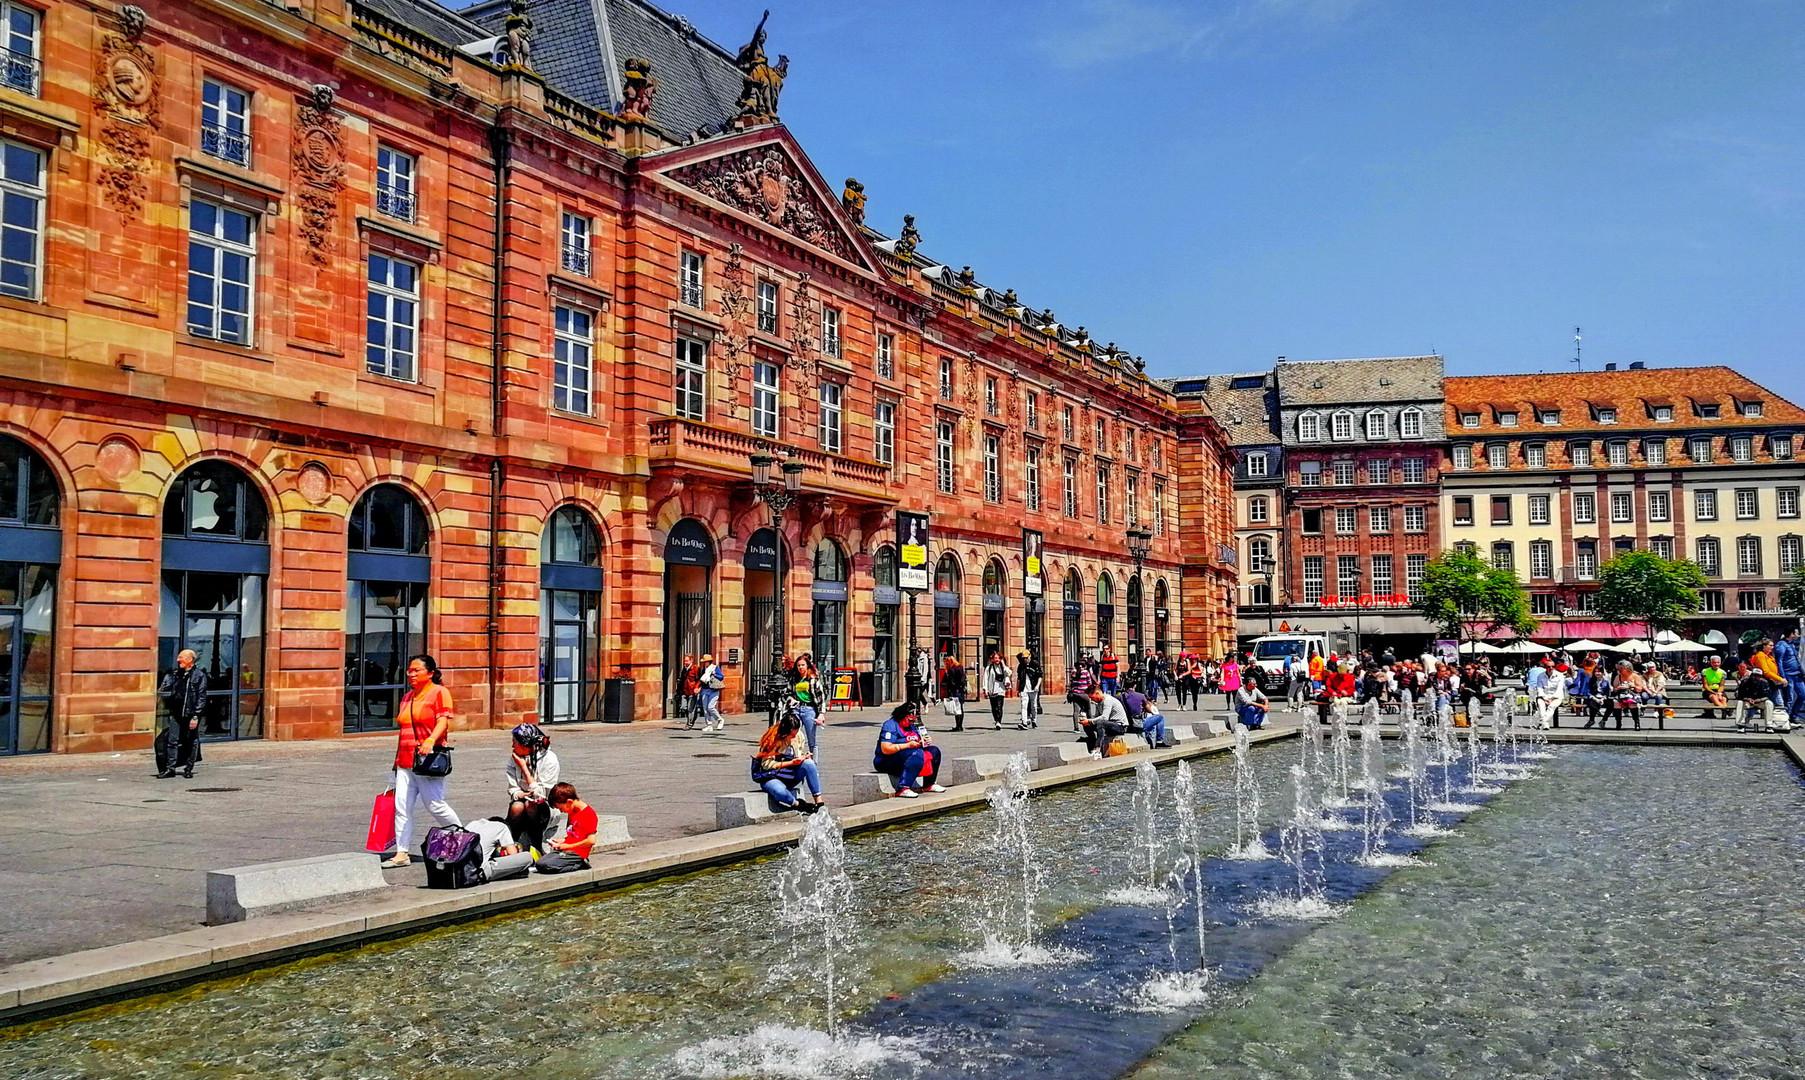 Площадь Кляйбера, Страсбург